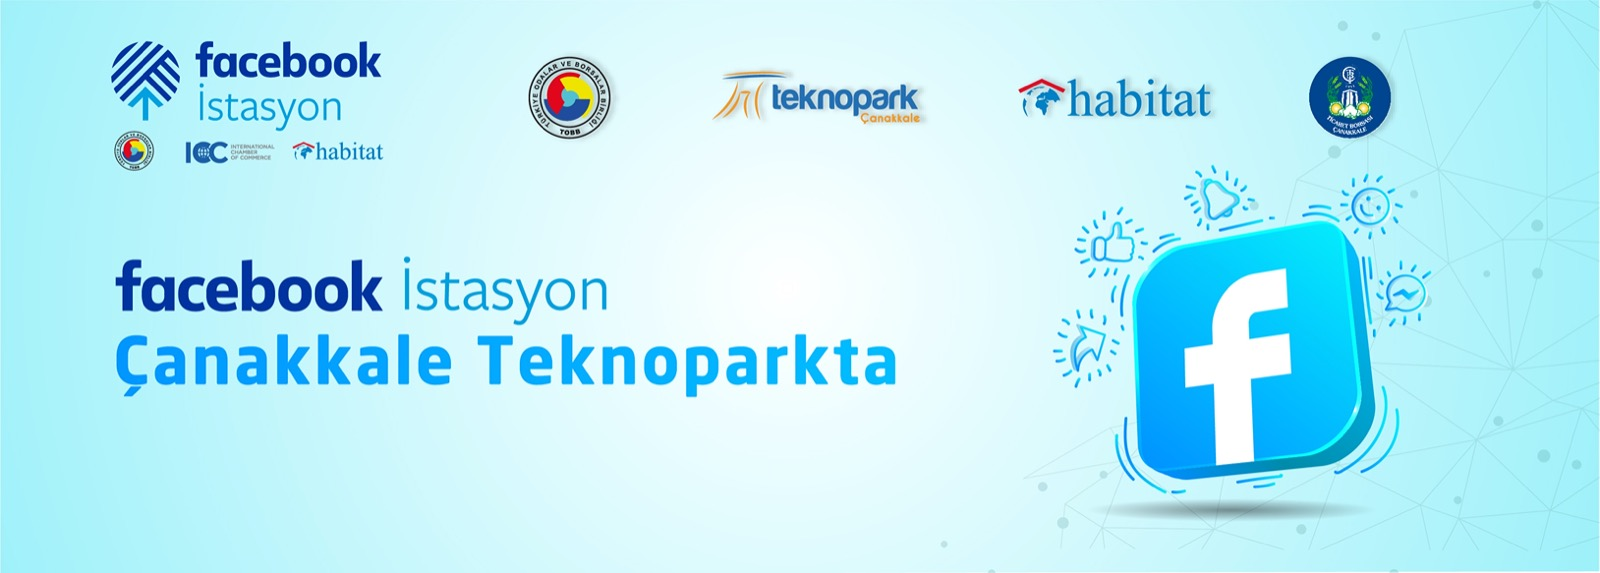 Facebook İstasyon Çanakkale Teknopark'ta